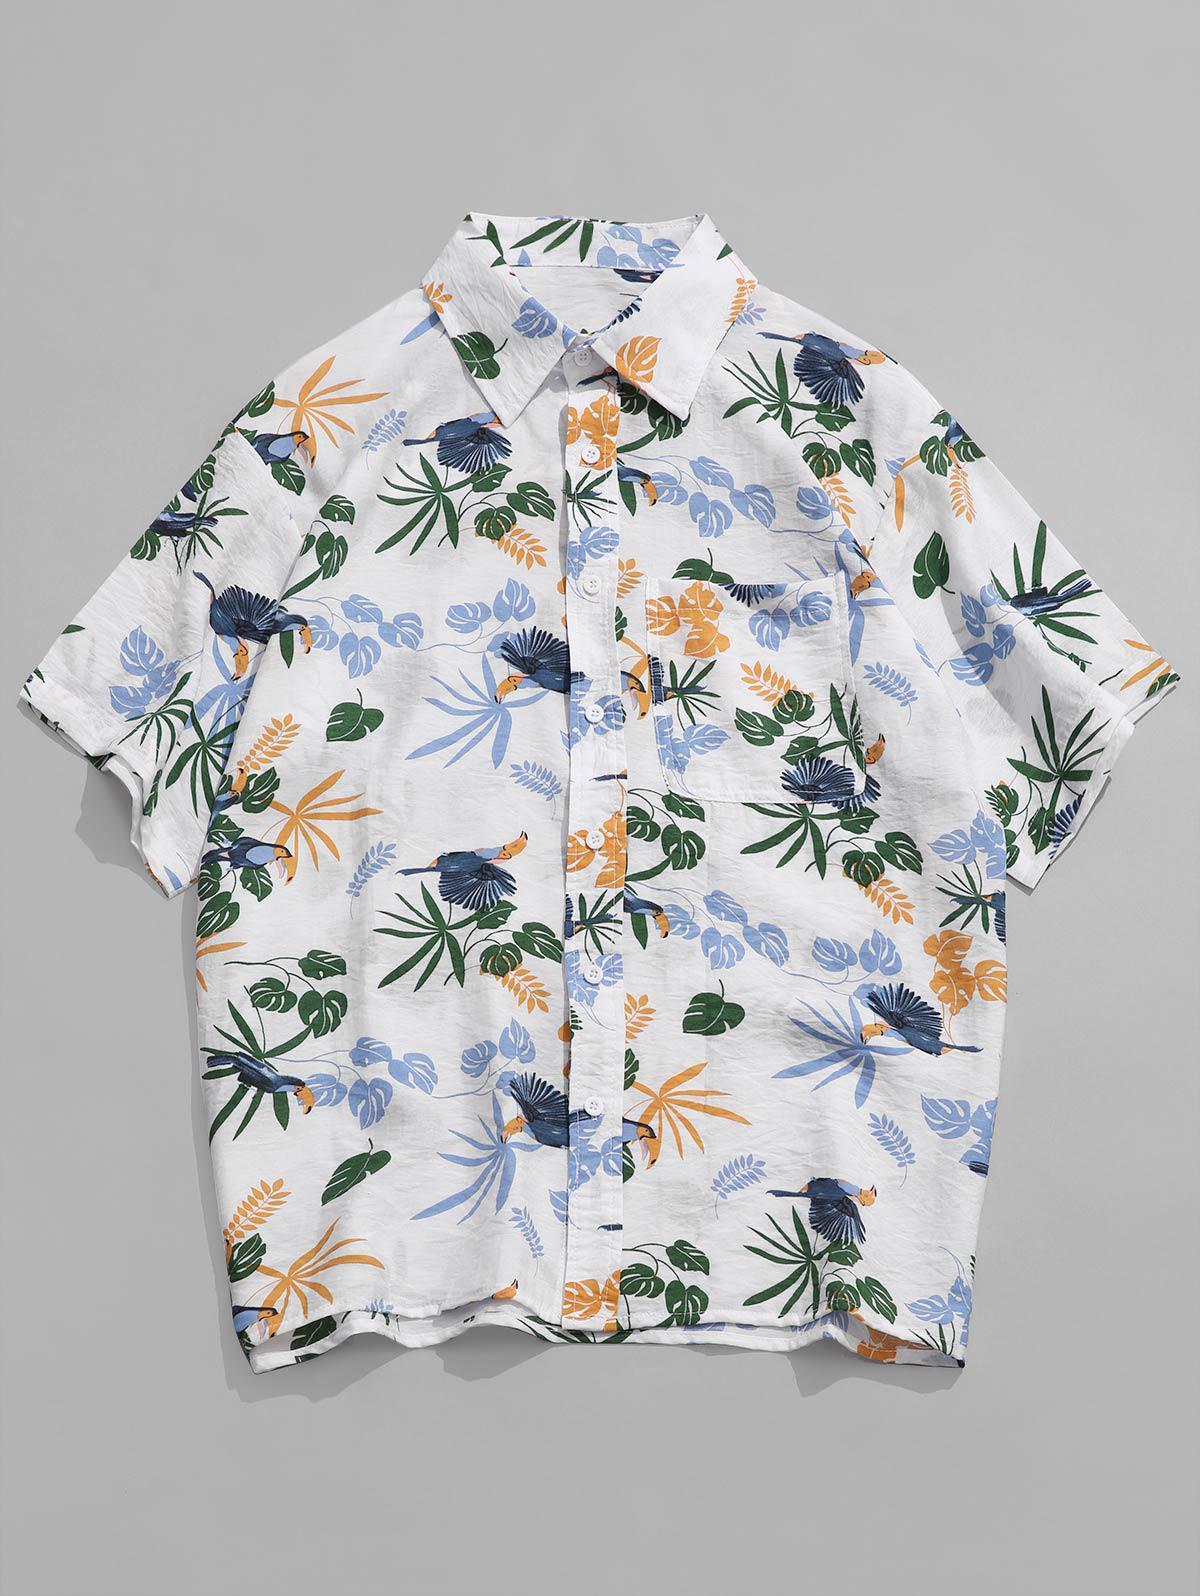 Pianta Tropicale Stampa Uccello Holiday Beach Shirt